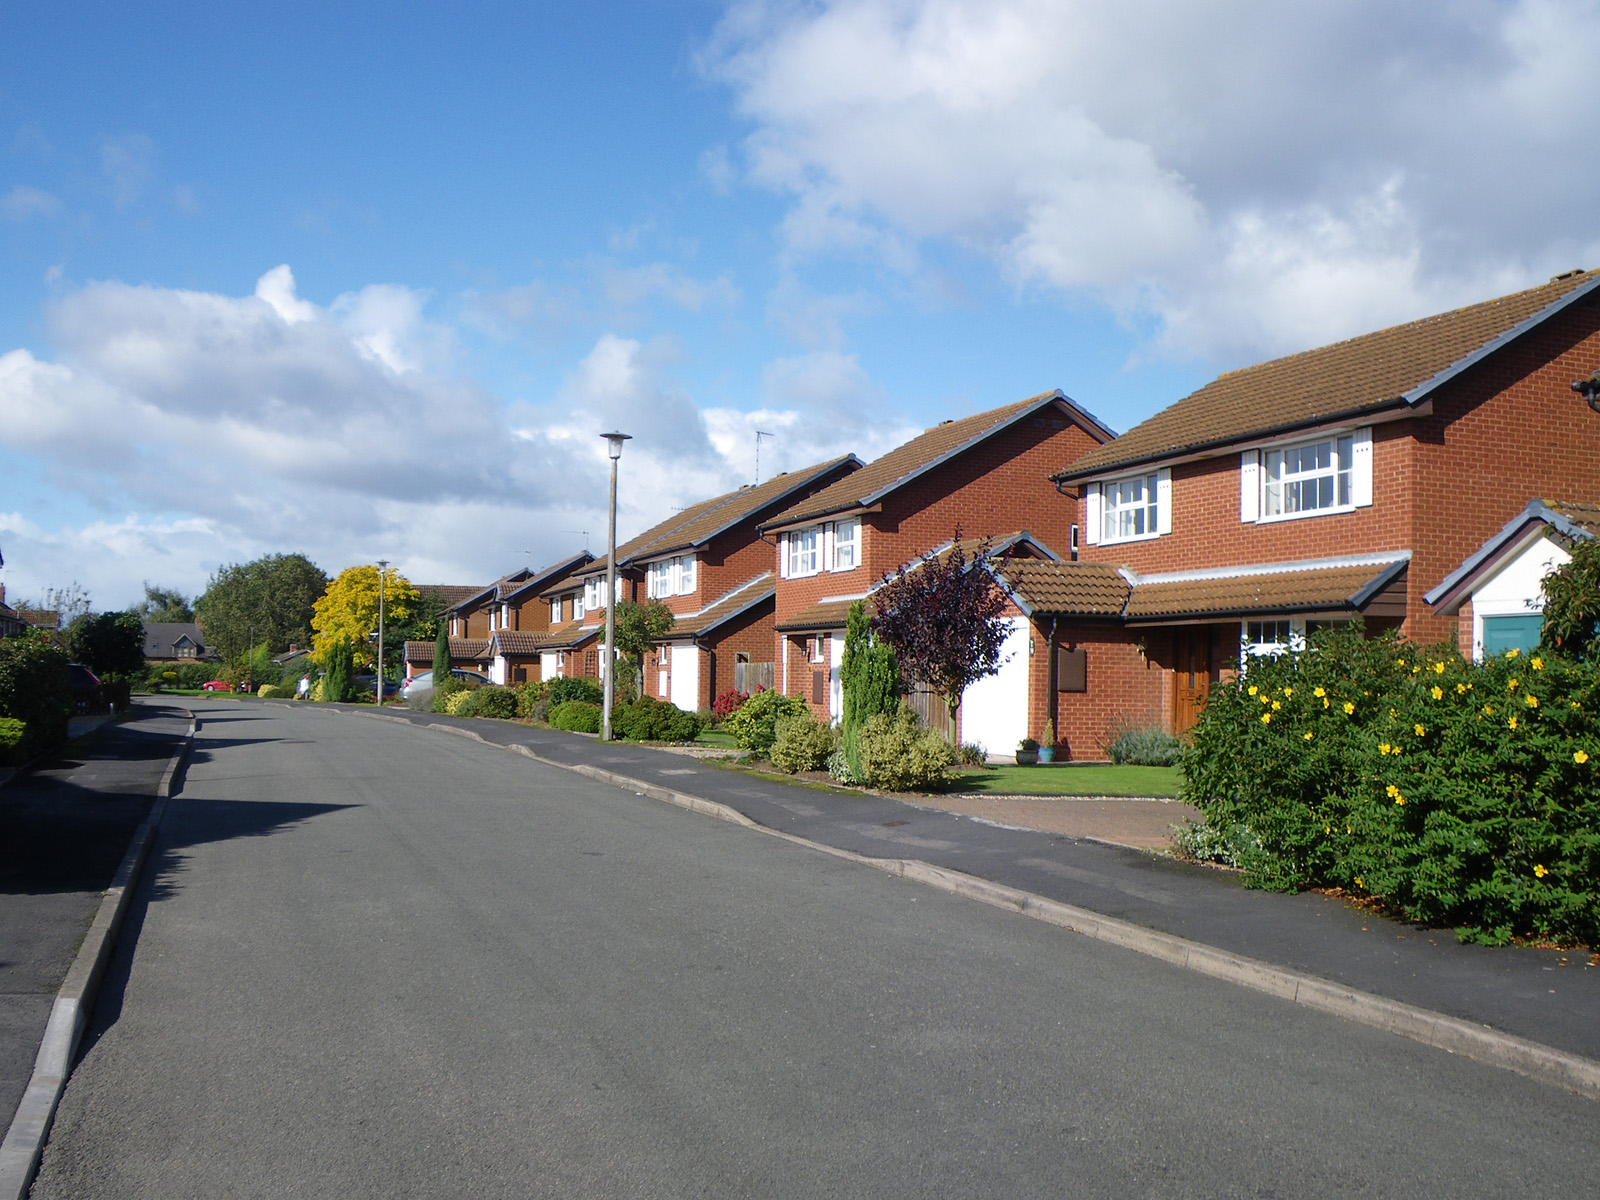 american suburbia in david hasberstams summary of the fifties